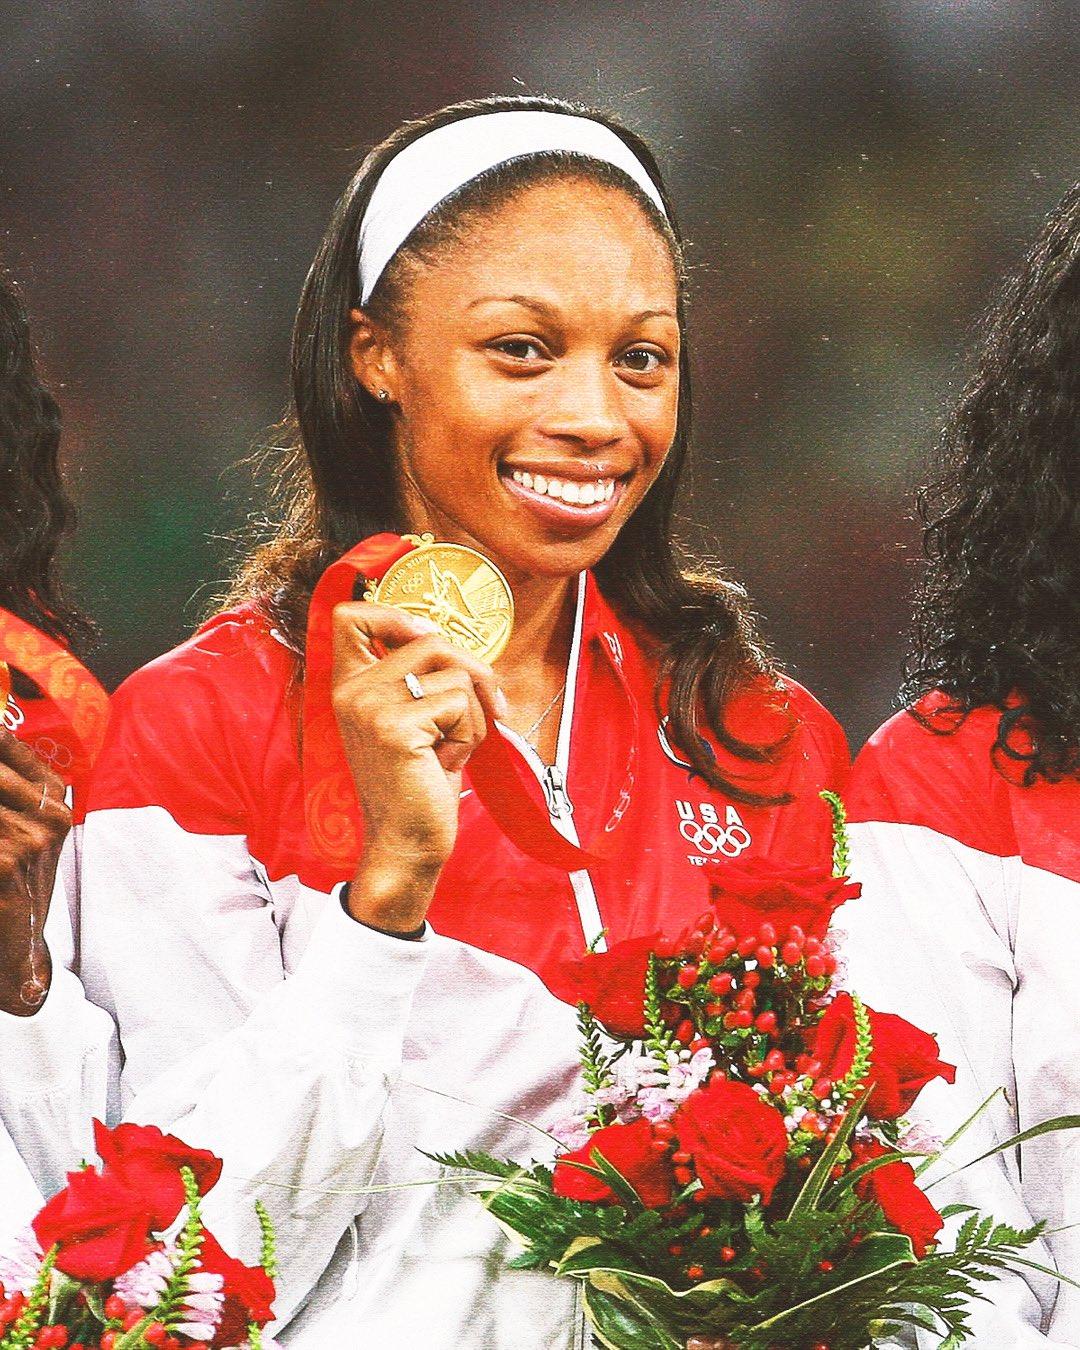 Allyson Felix at the 2016 Rio Olympics